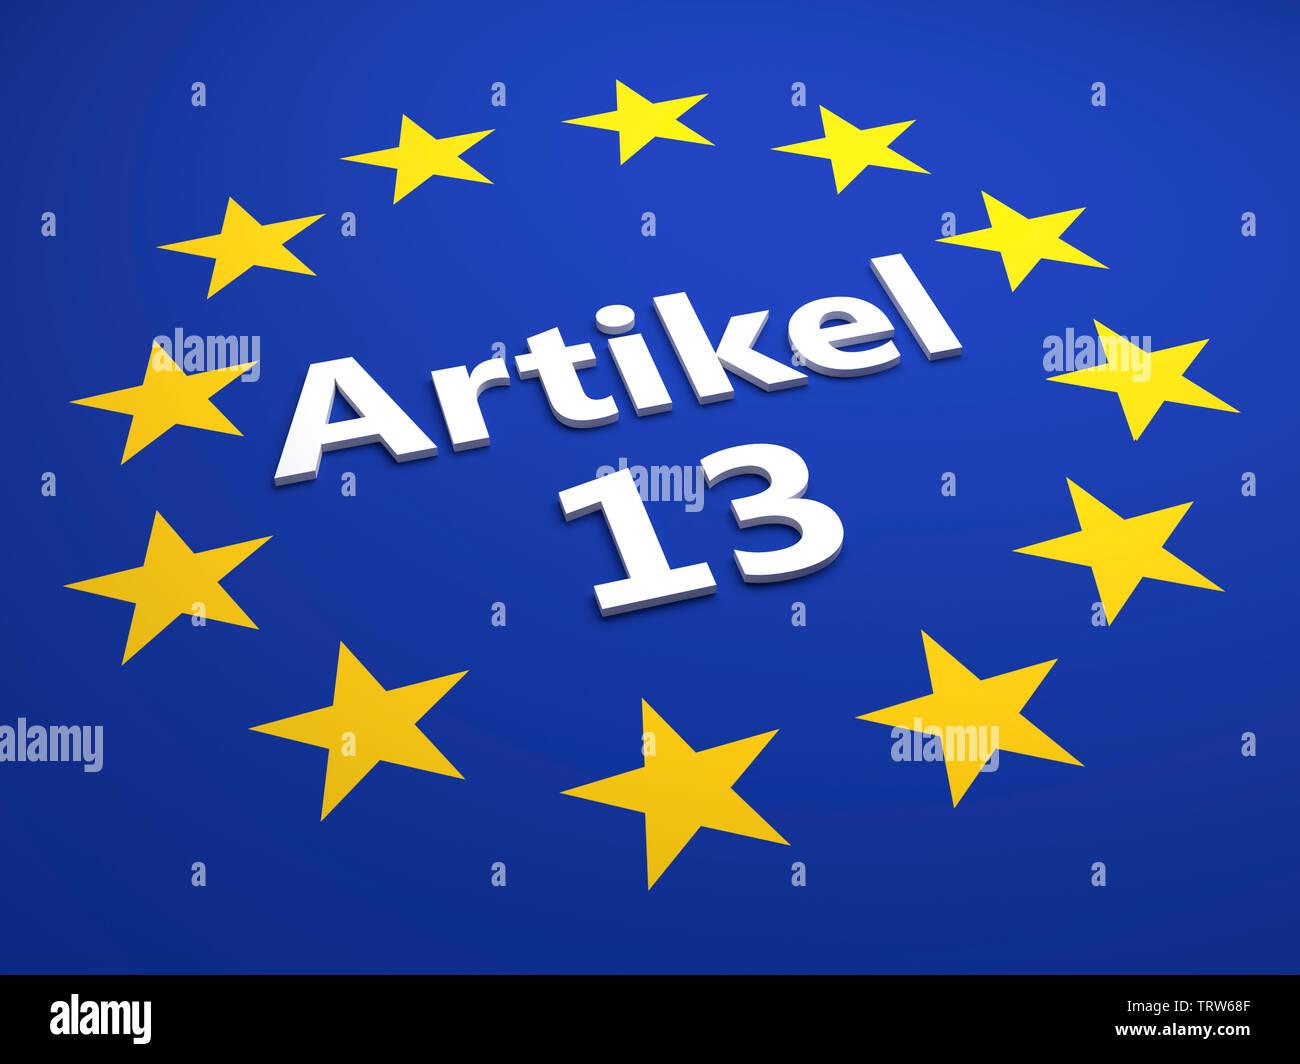 Artikel 13 Stock Photo